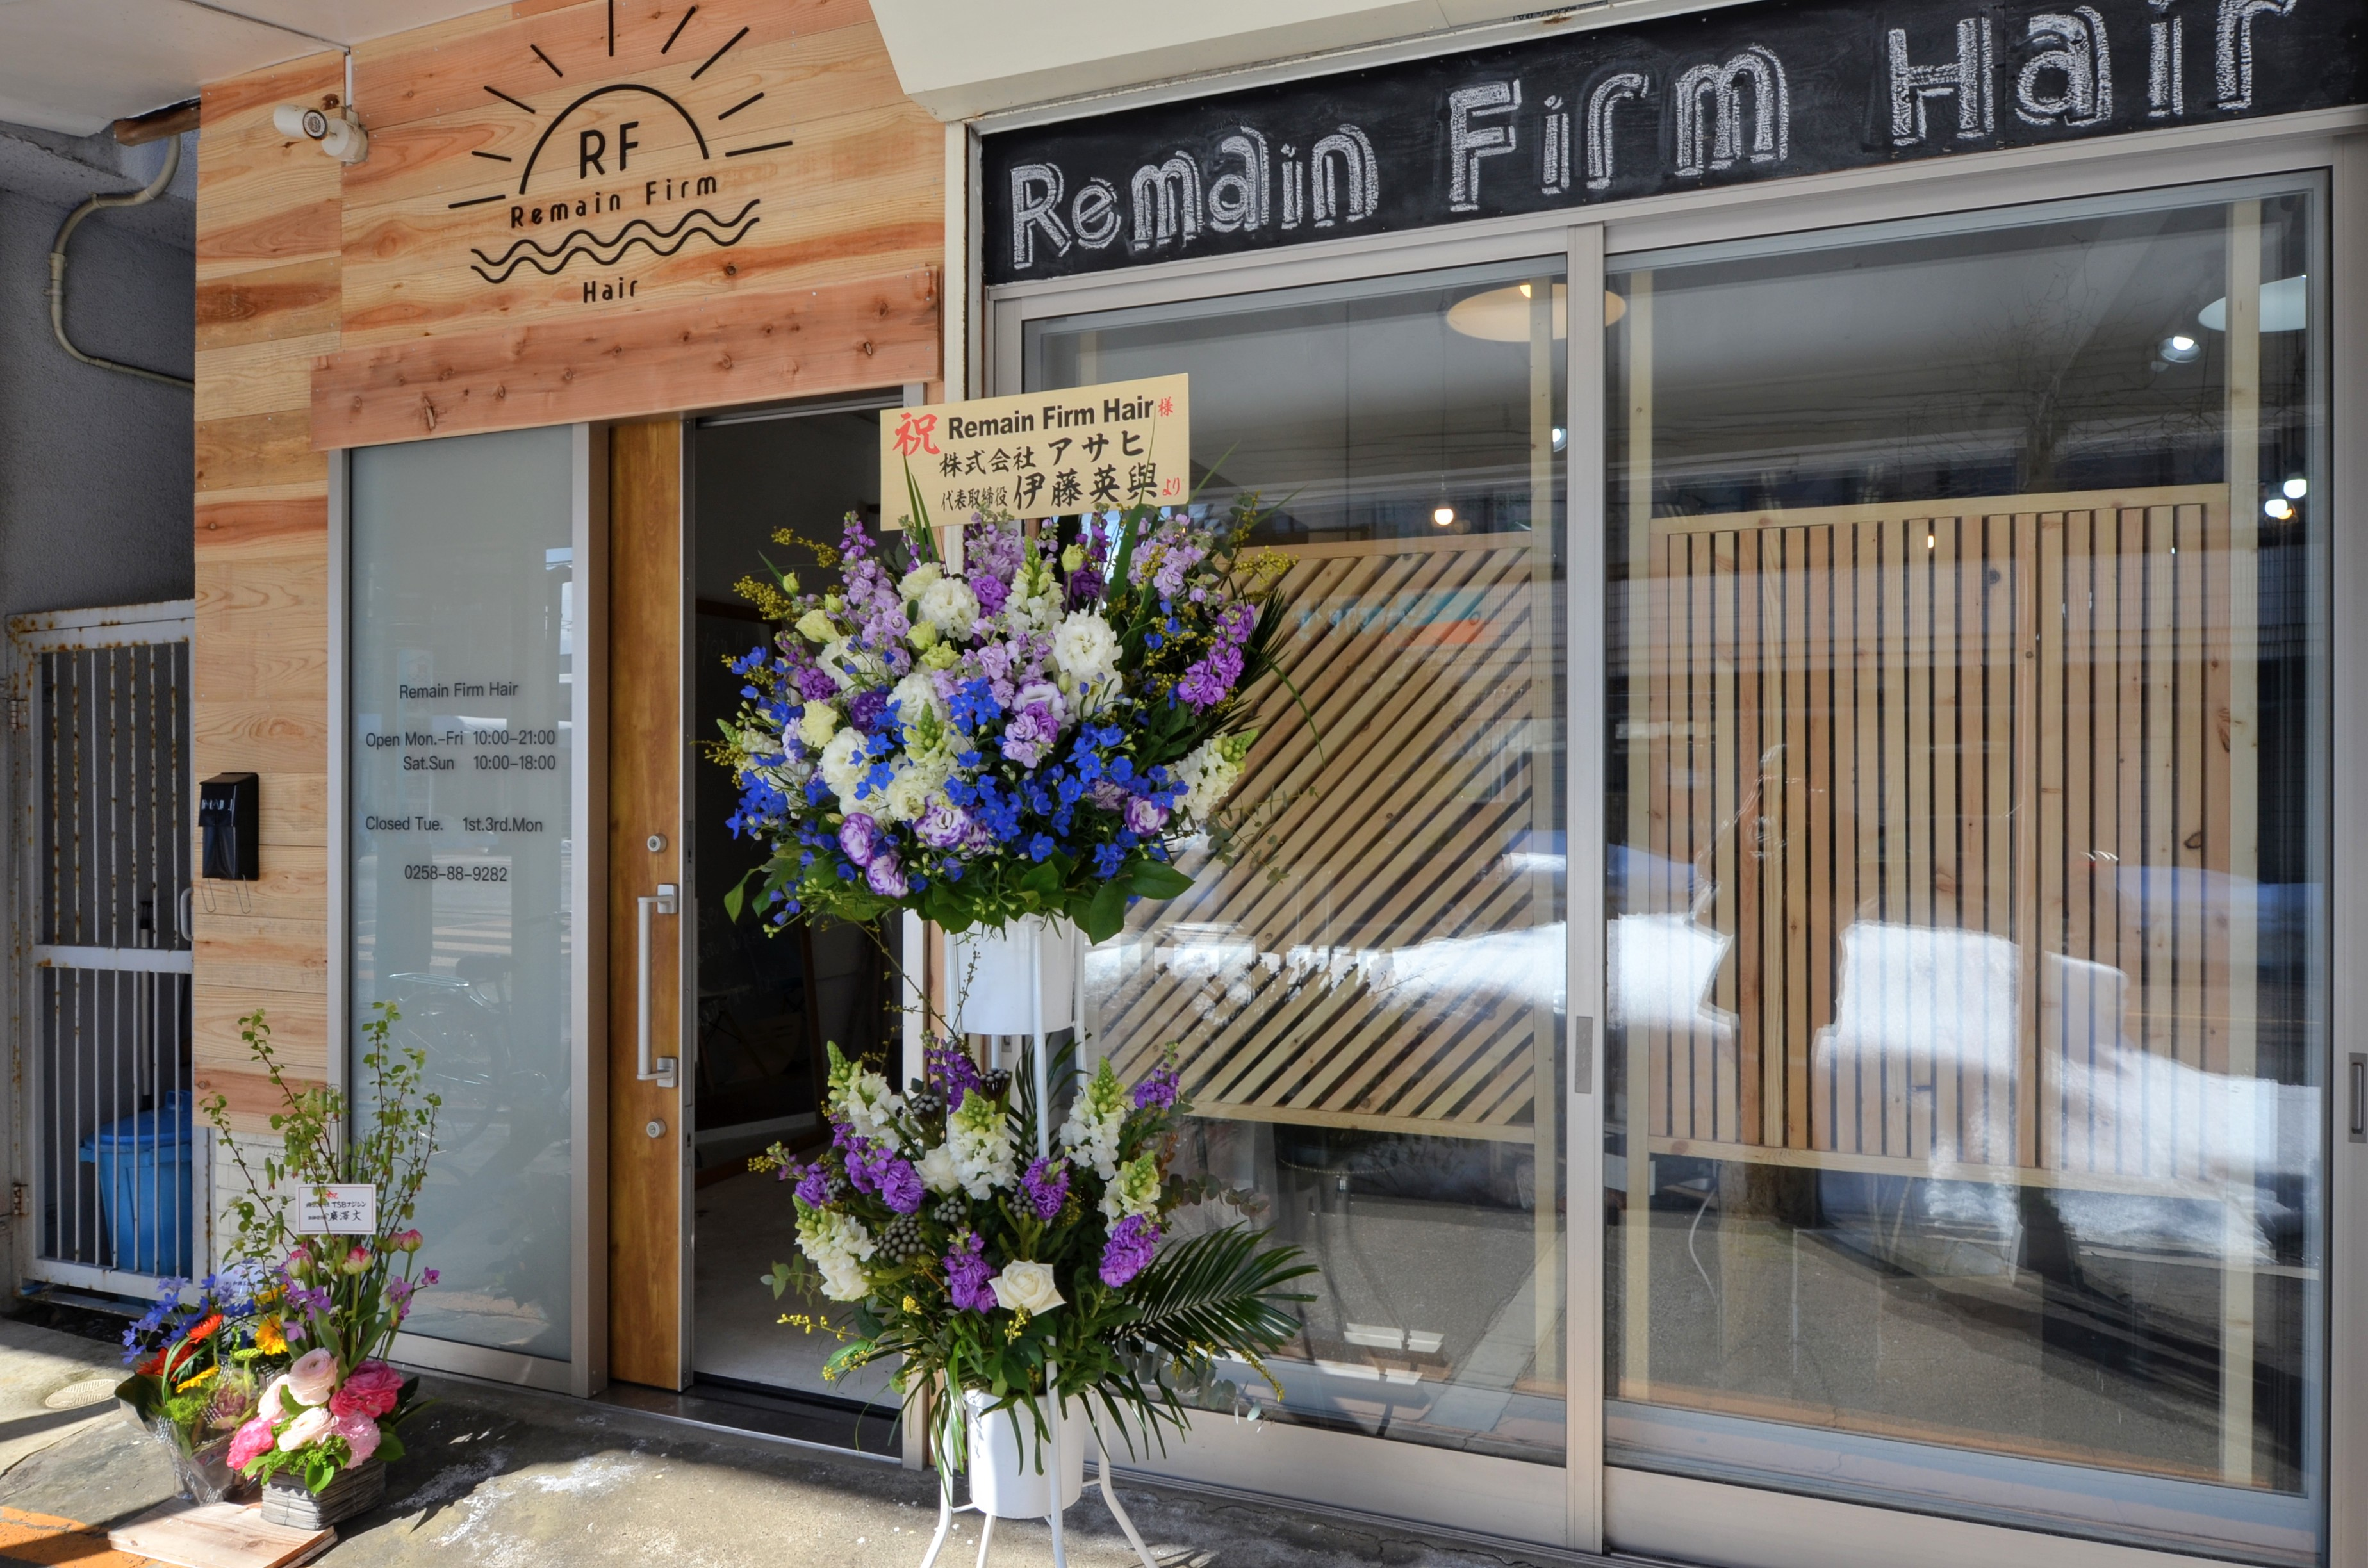 Remain Firm Hair (美容室)さんがオープンになりました。